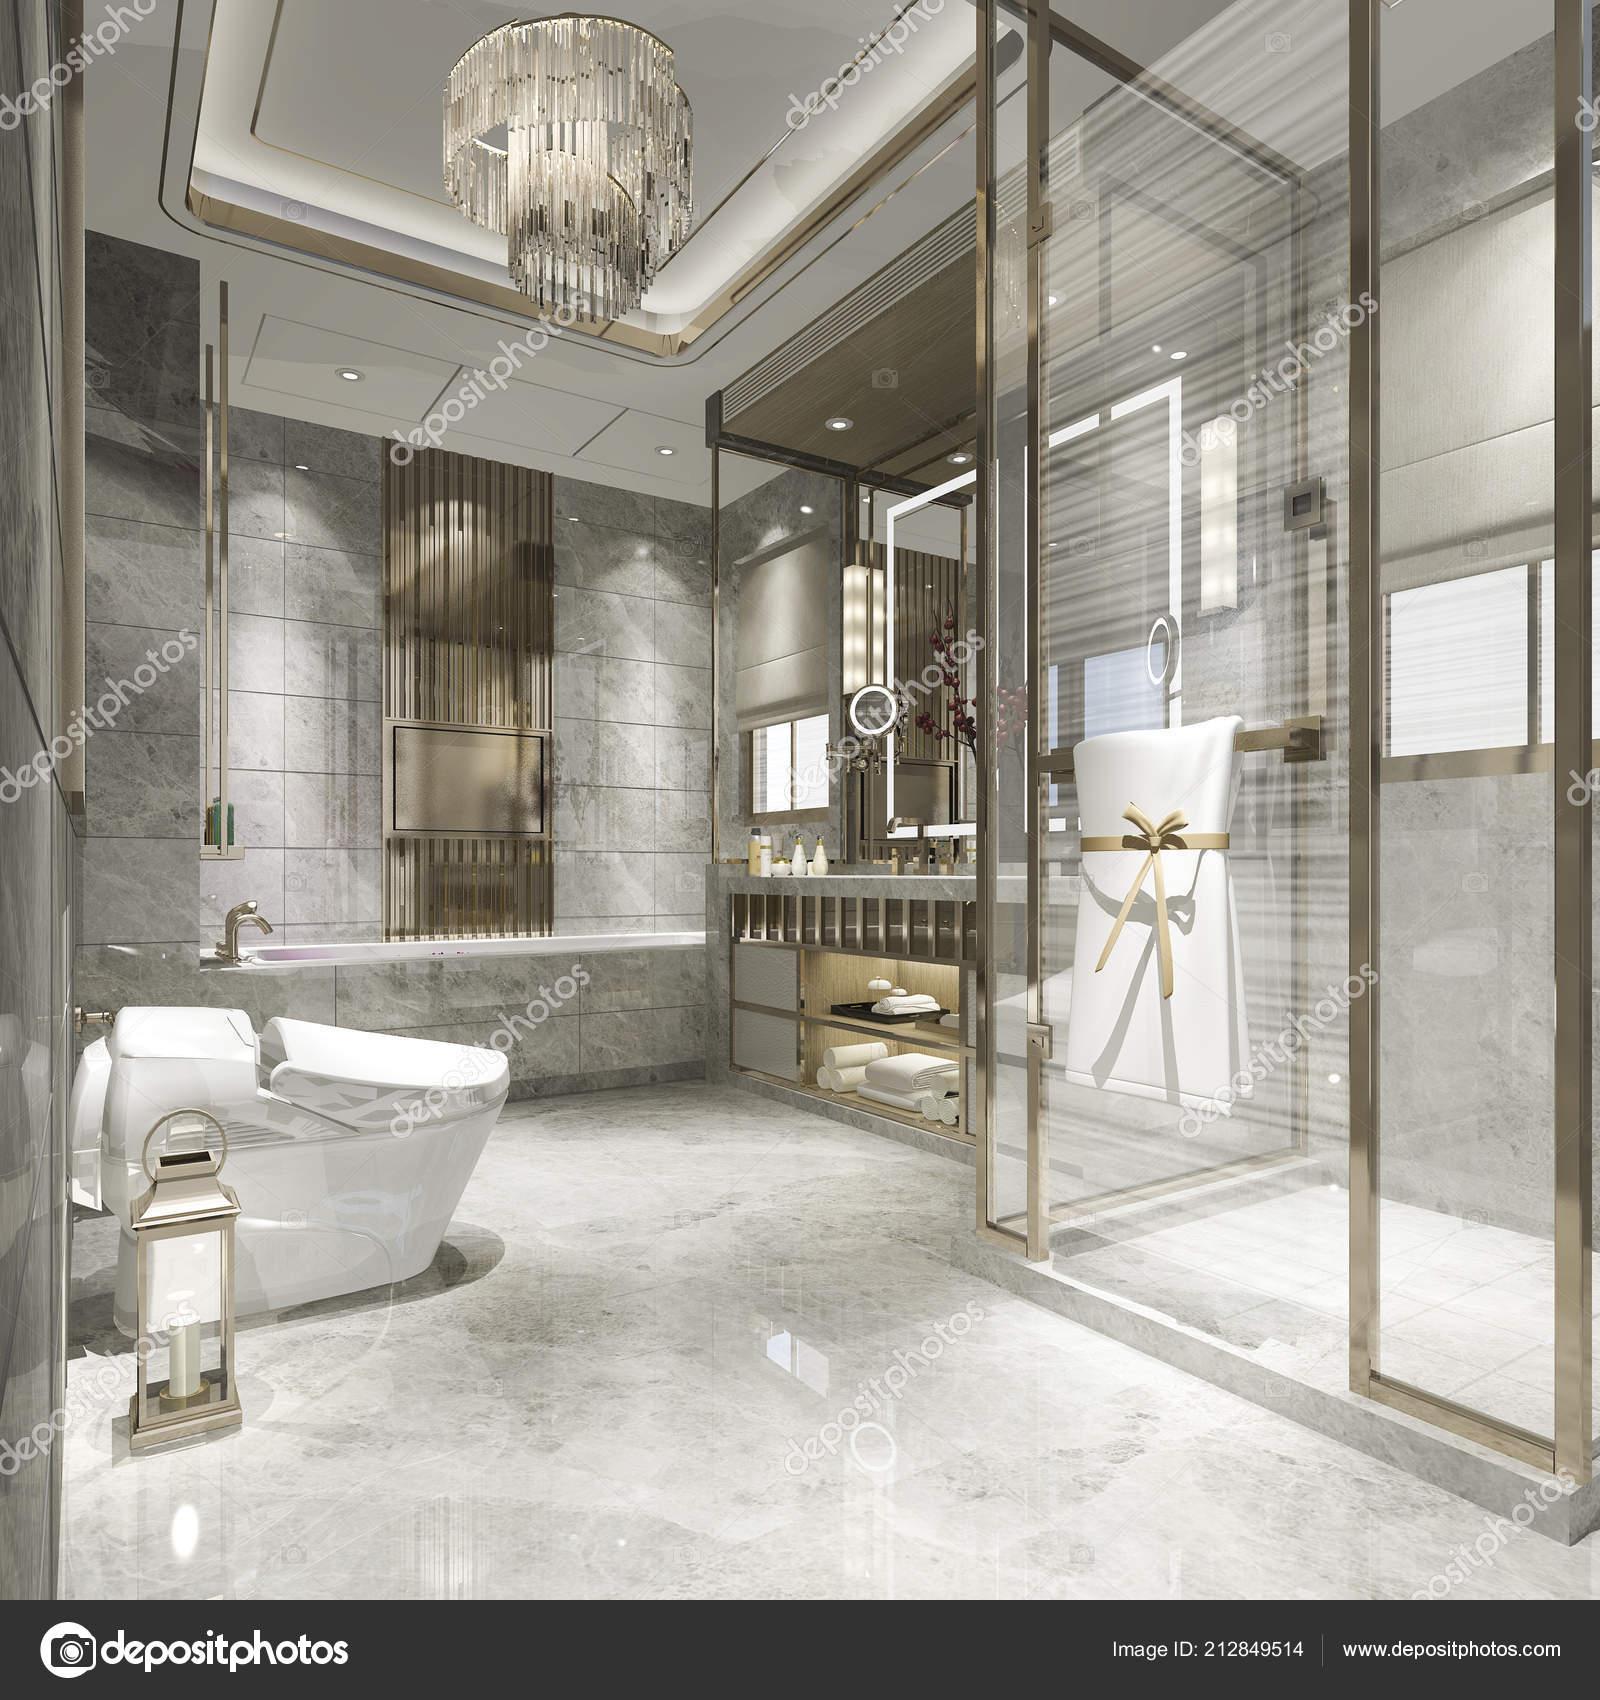 Salle Bains Moderne Rendu Avec Luxe Carrelage Decoration